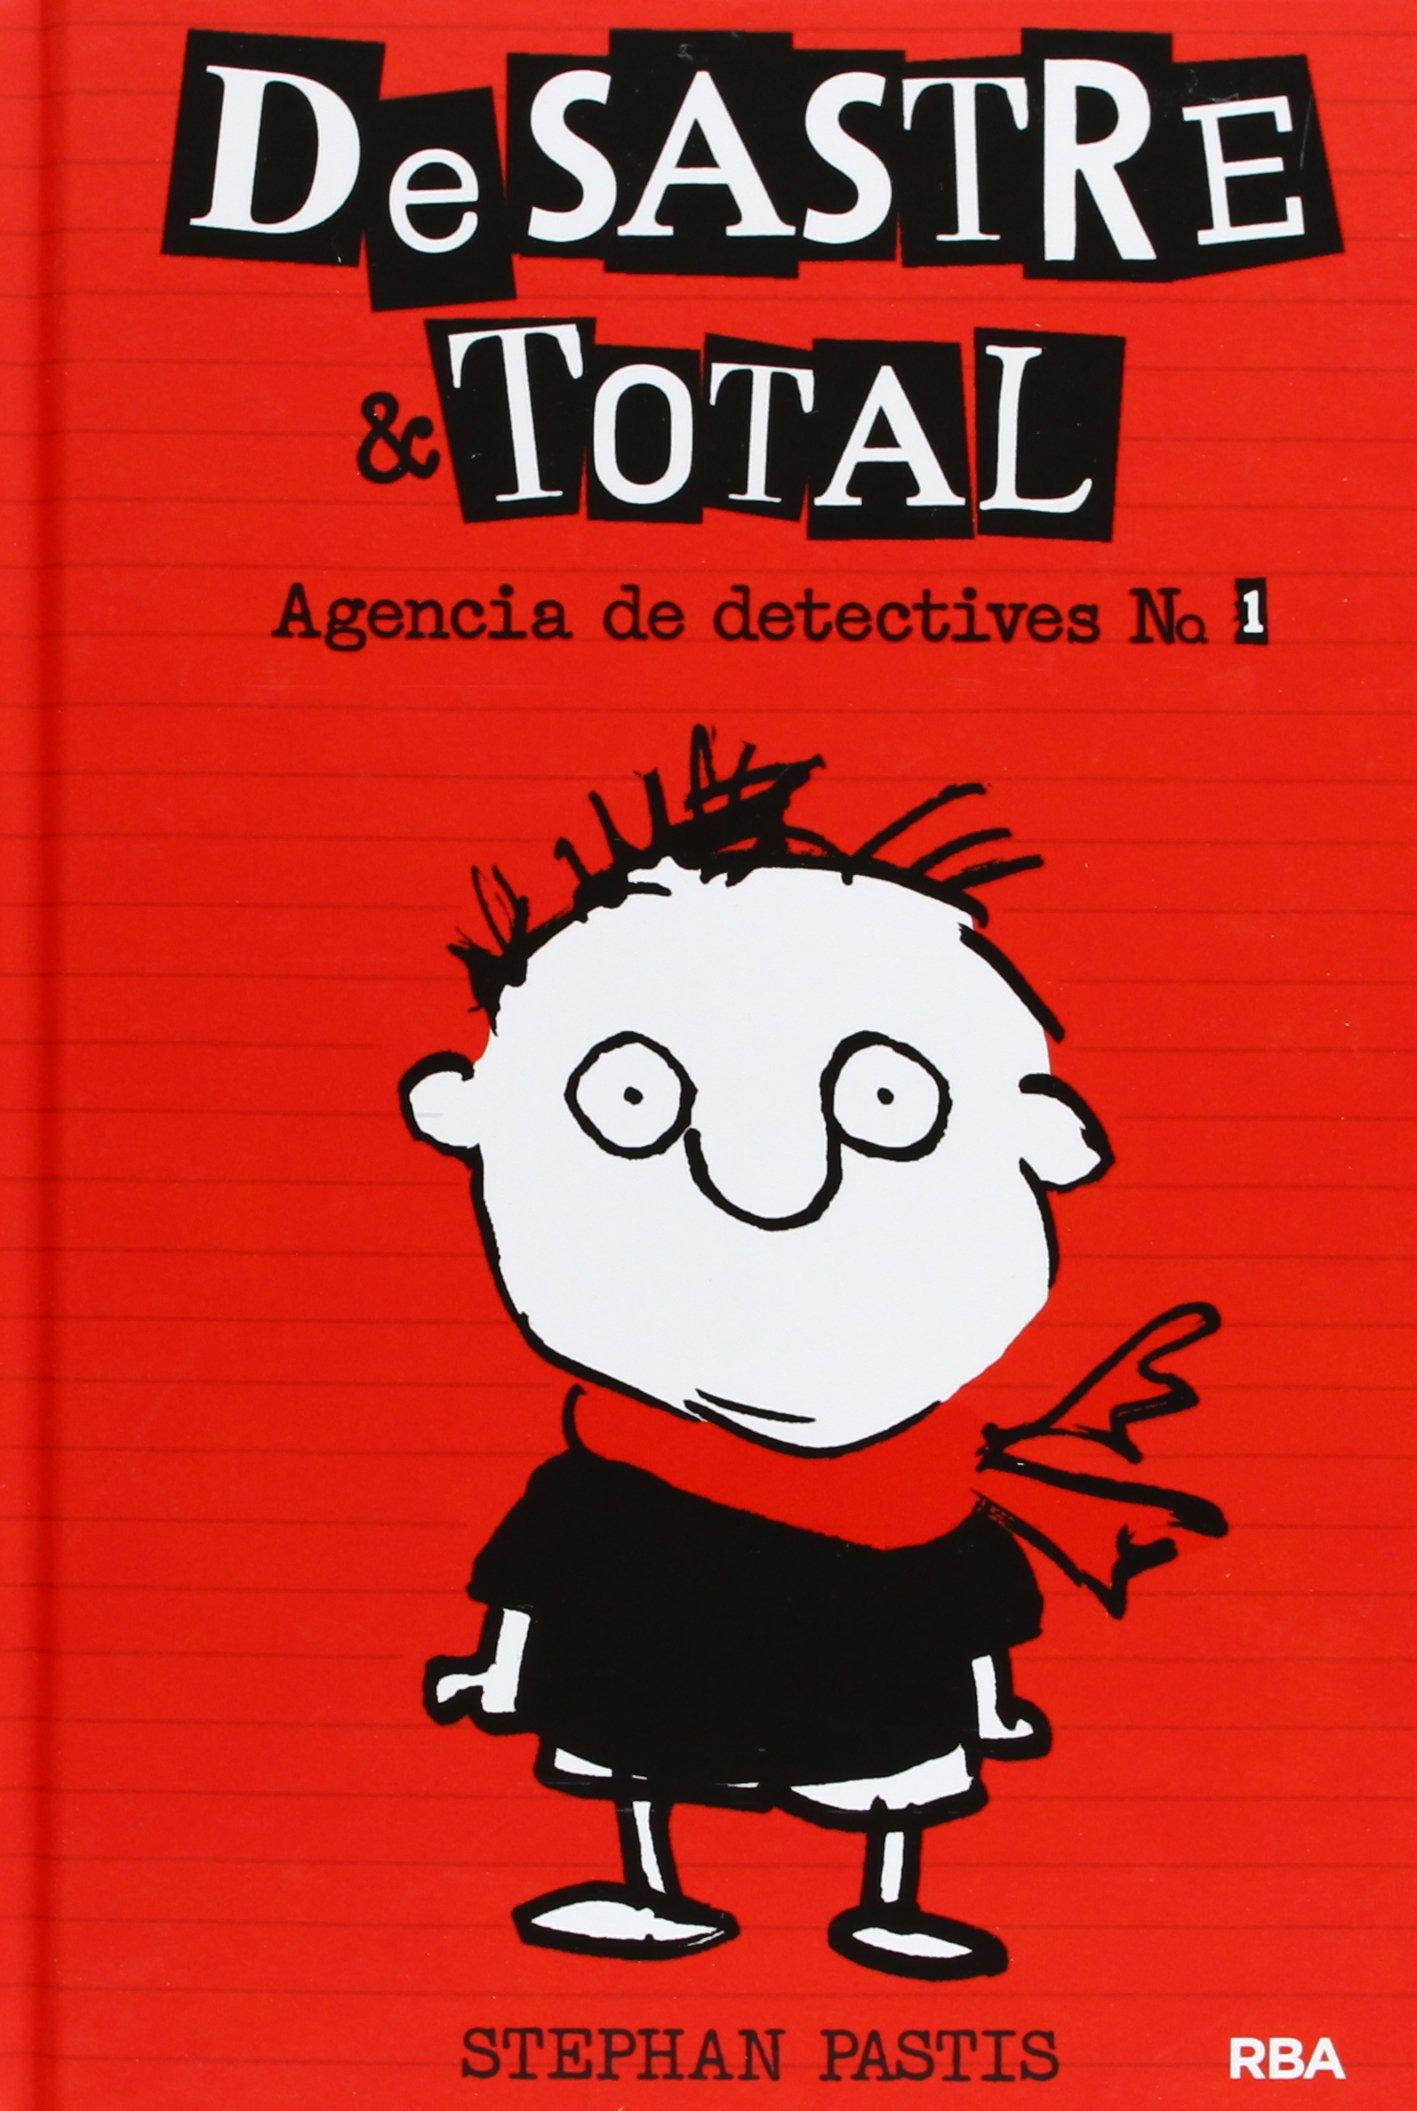 Desastre & Total: Agencia de Detectives # 1 (Spanish Edition)